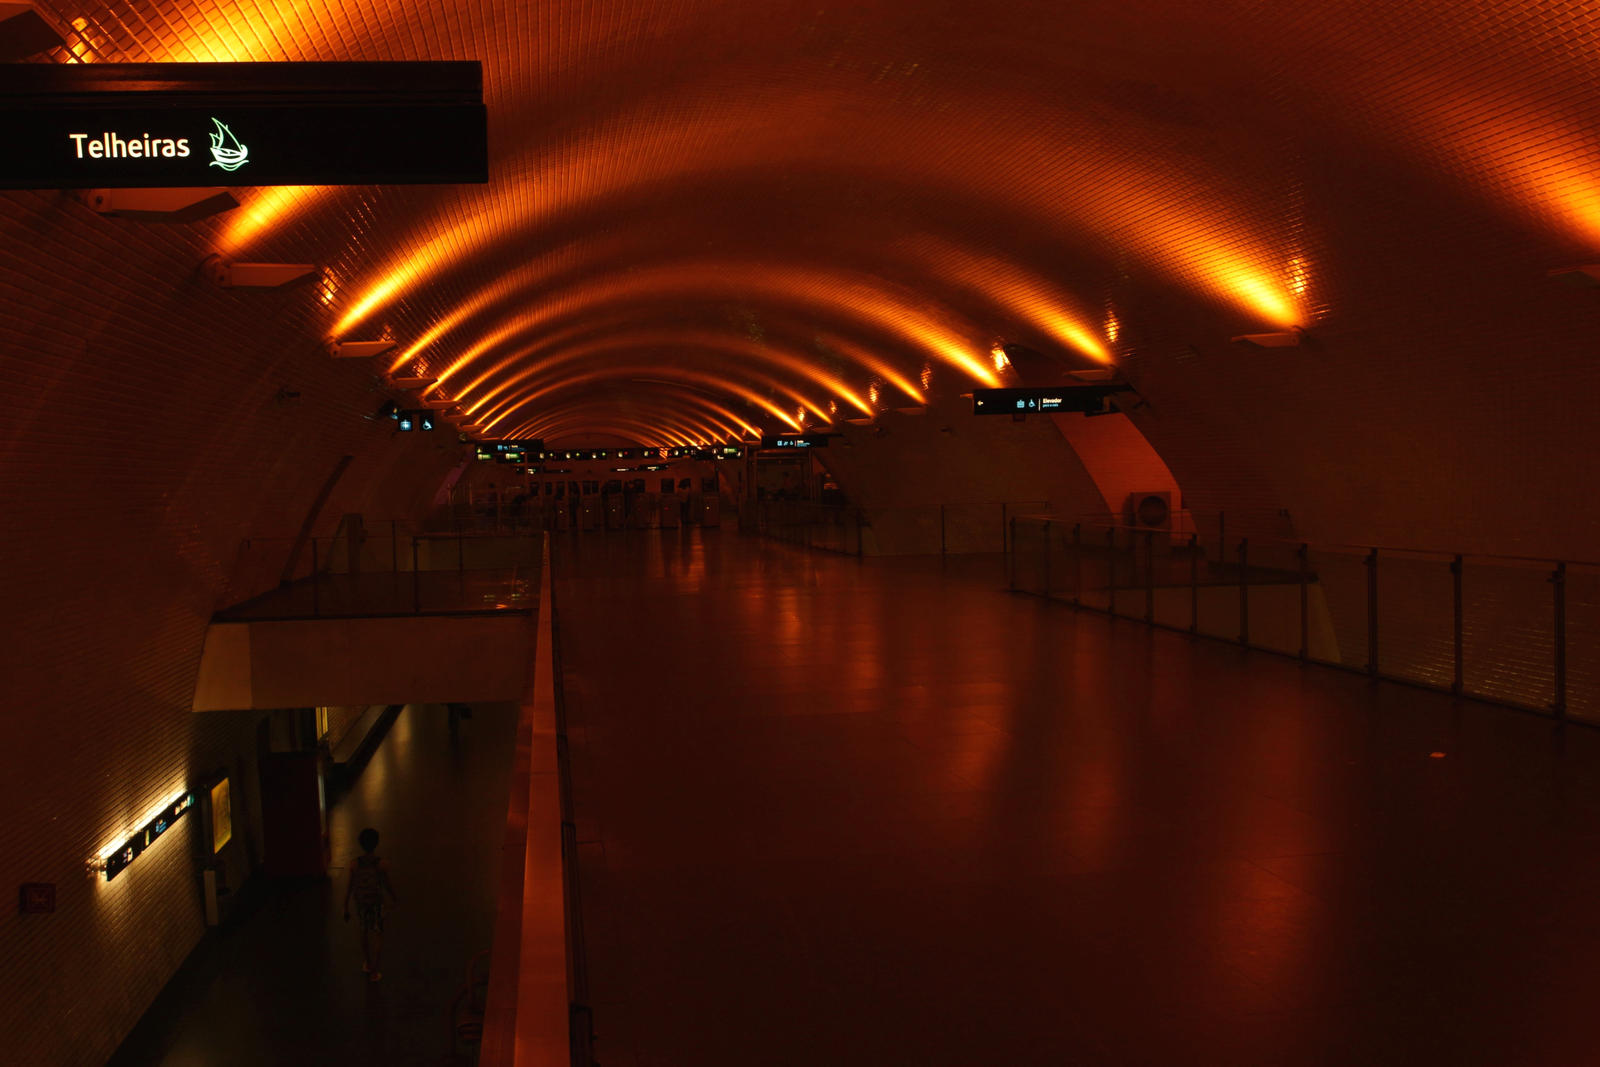 Lisboa - Metro Station by LoveForDetails